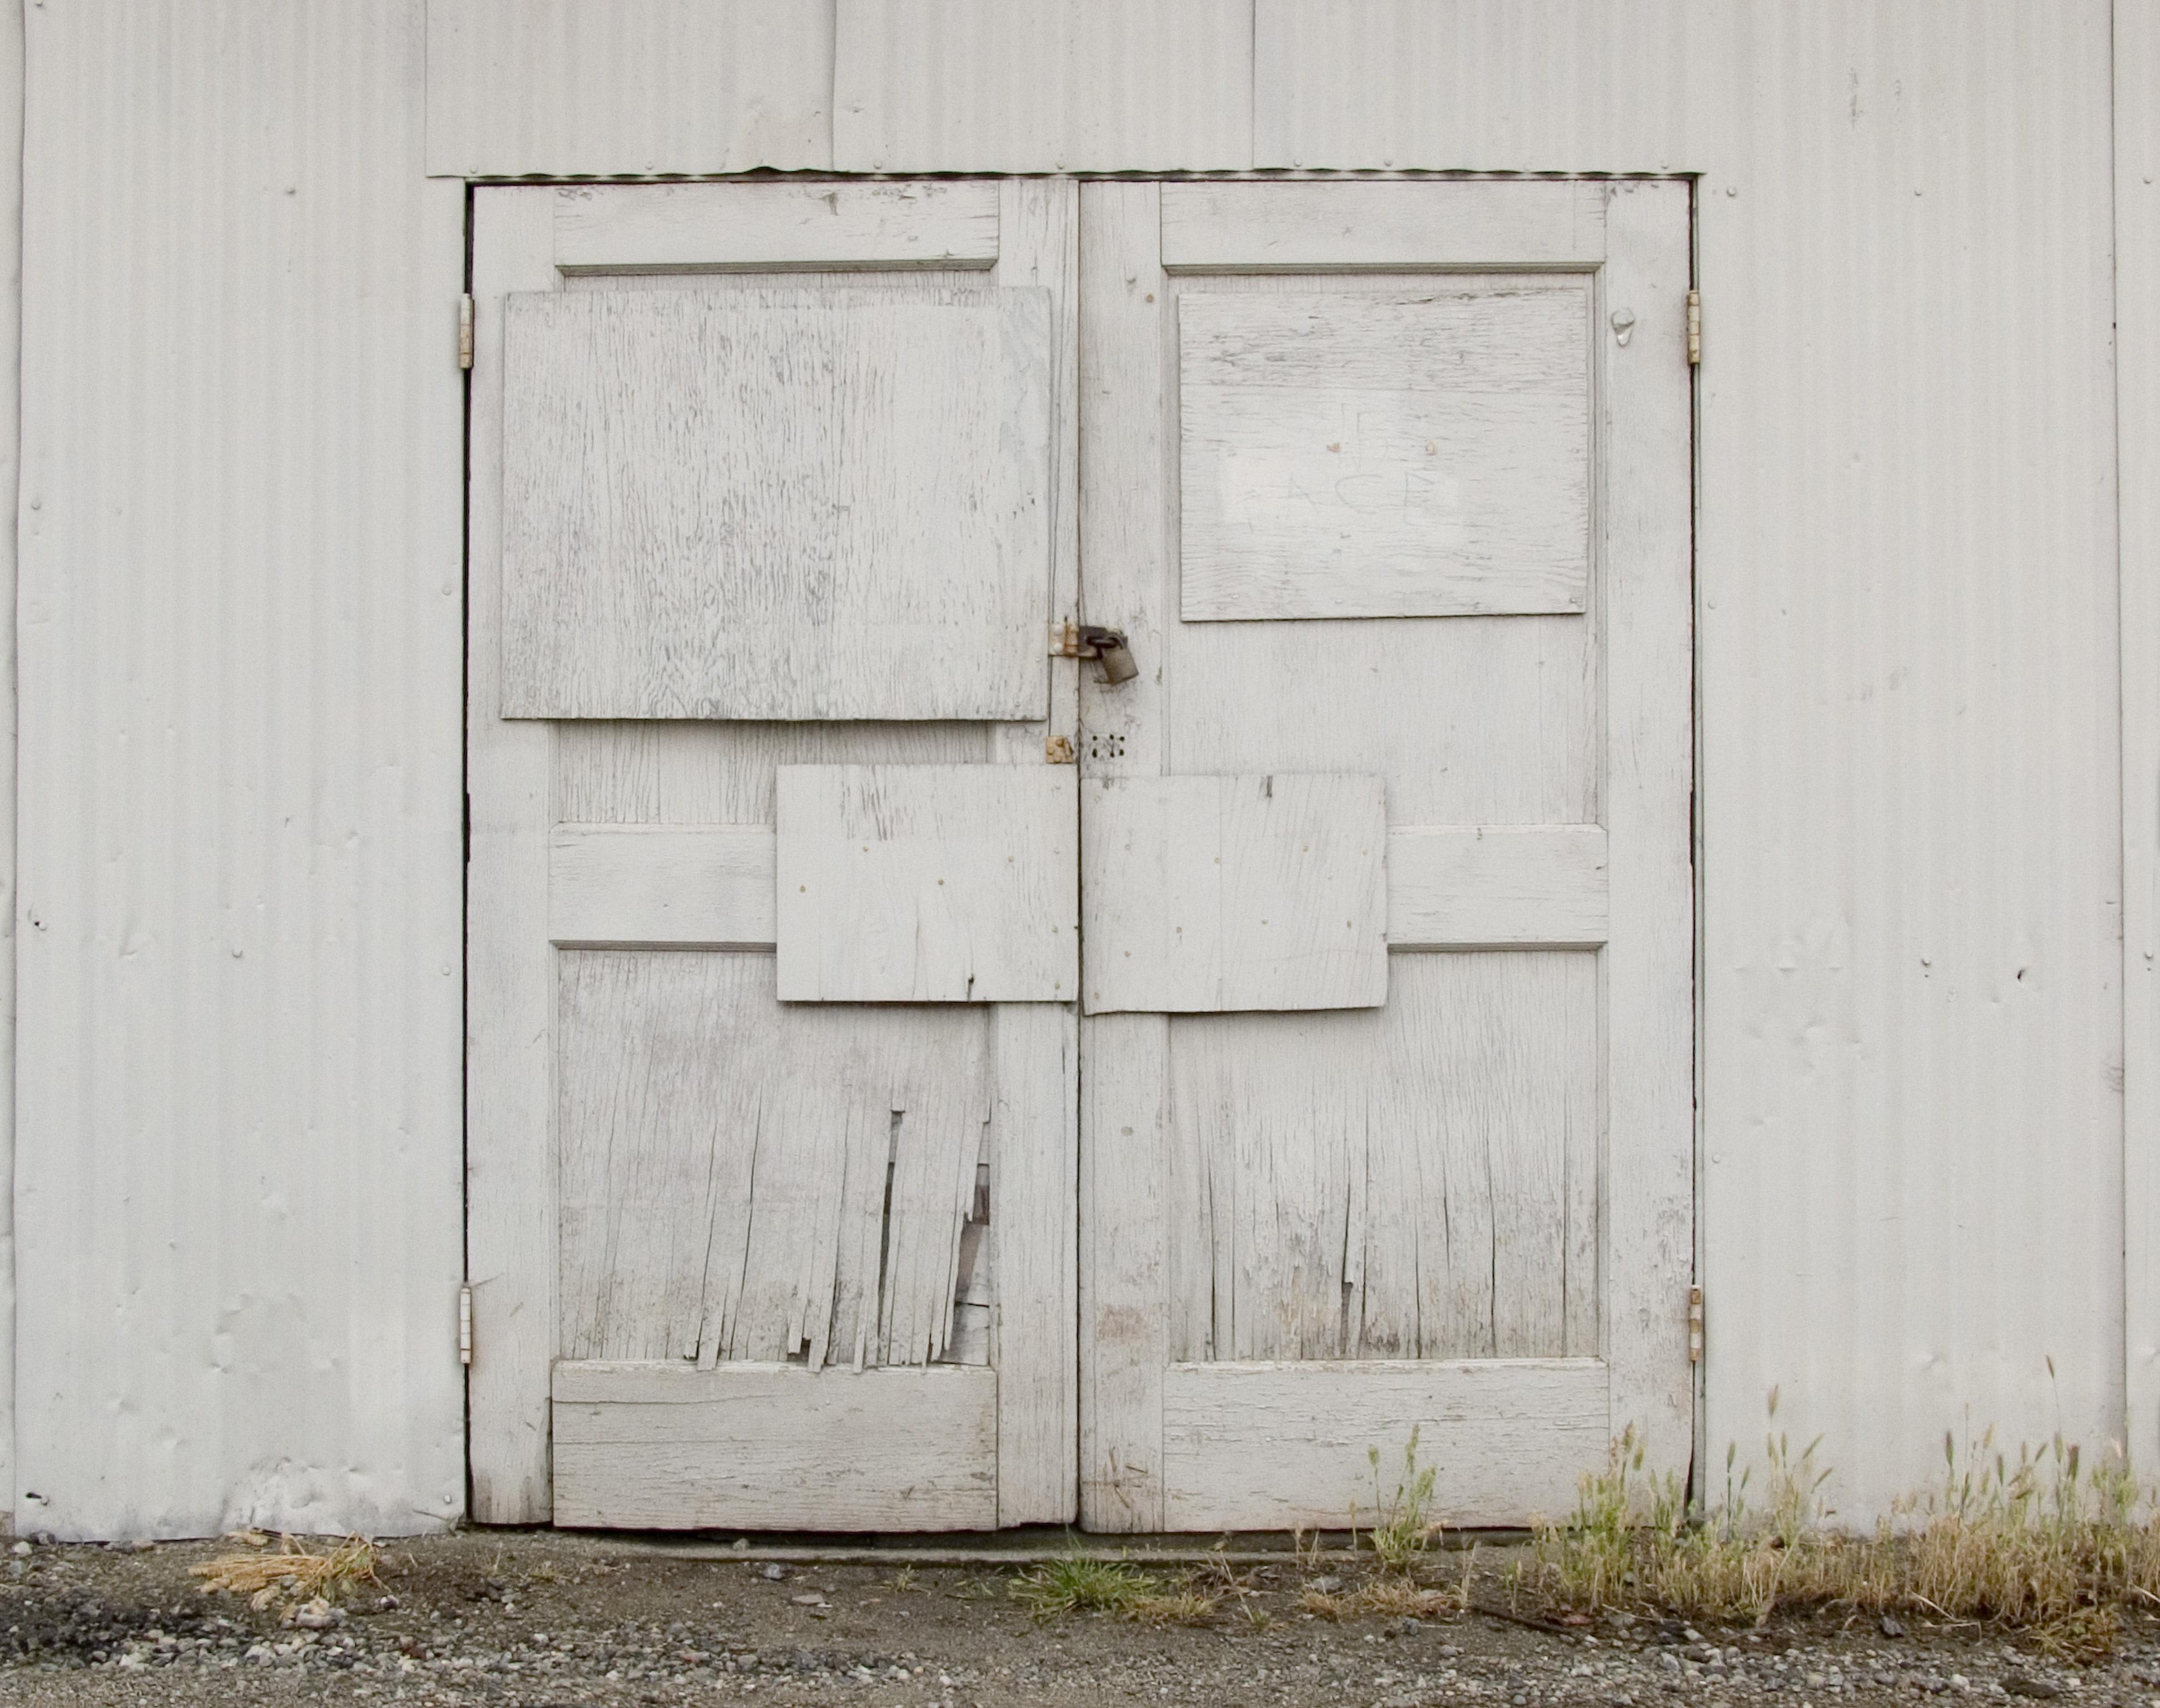 Fotos gratis : cerca, madera, blanco, edificio, antiguo, granero ...